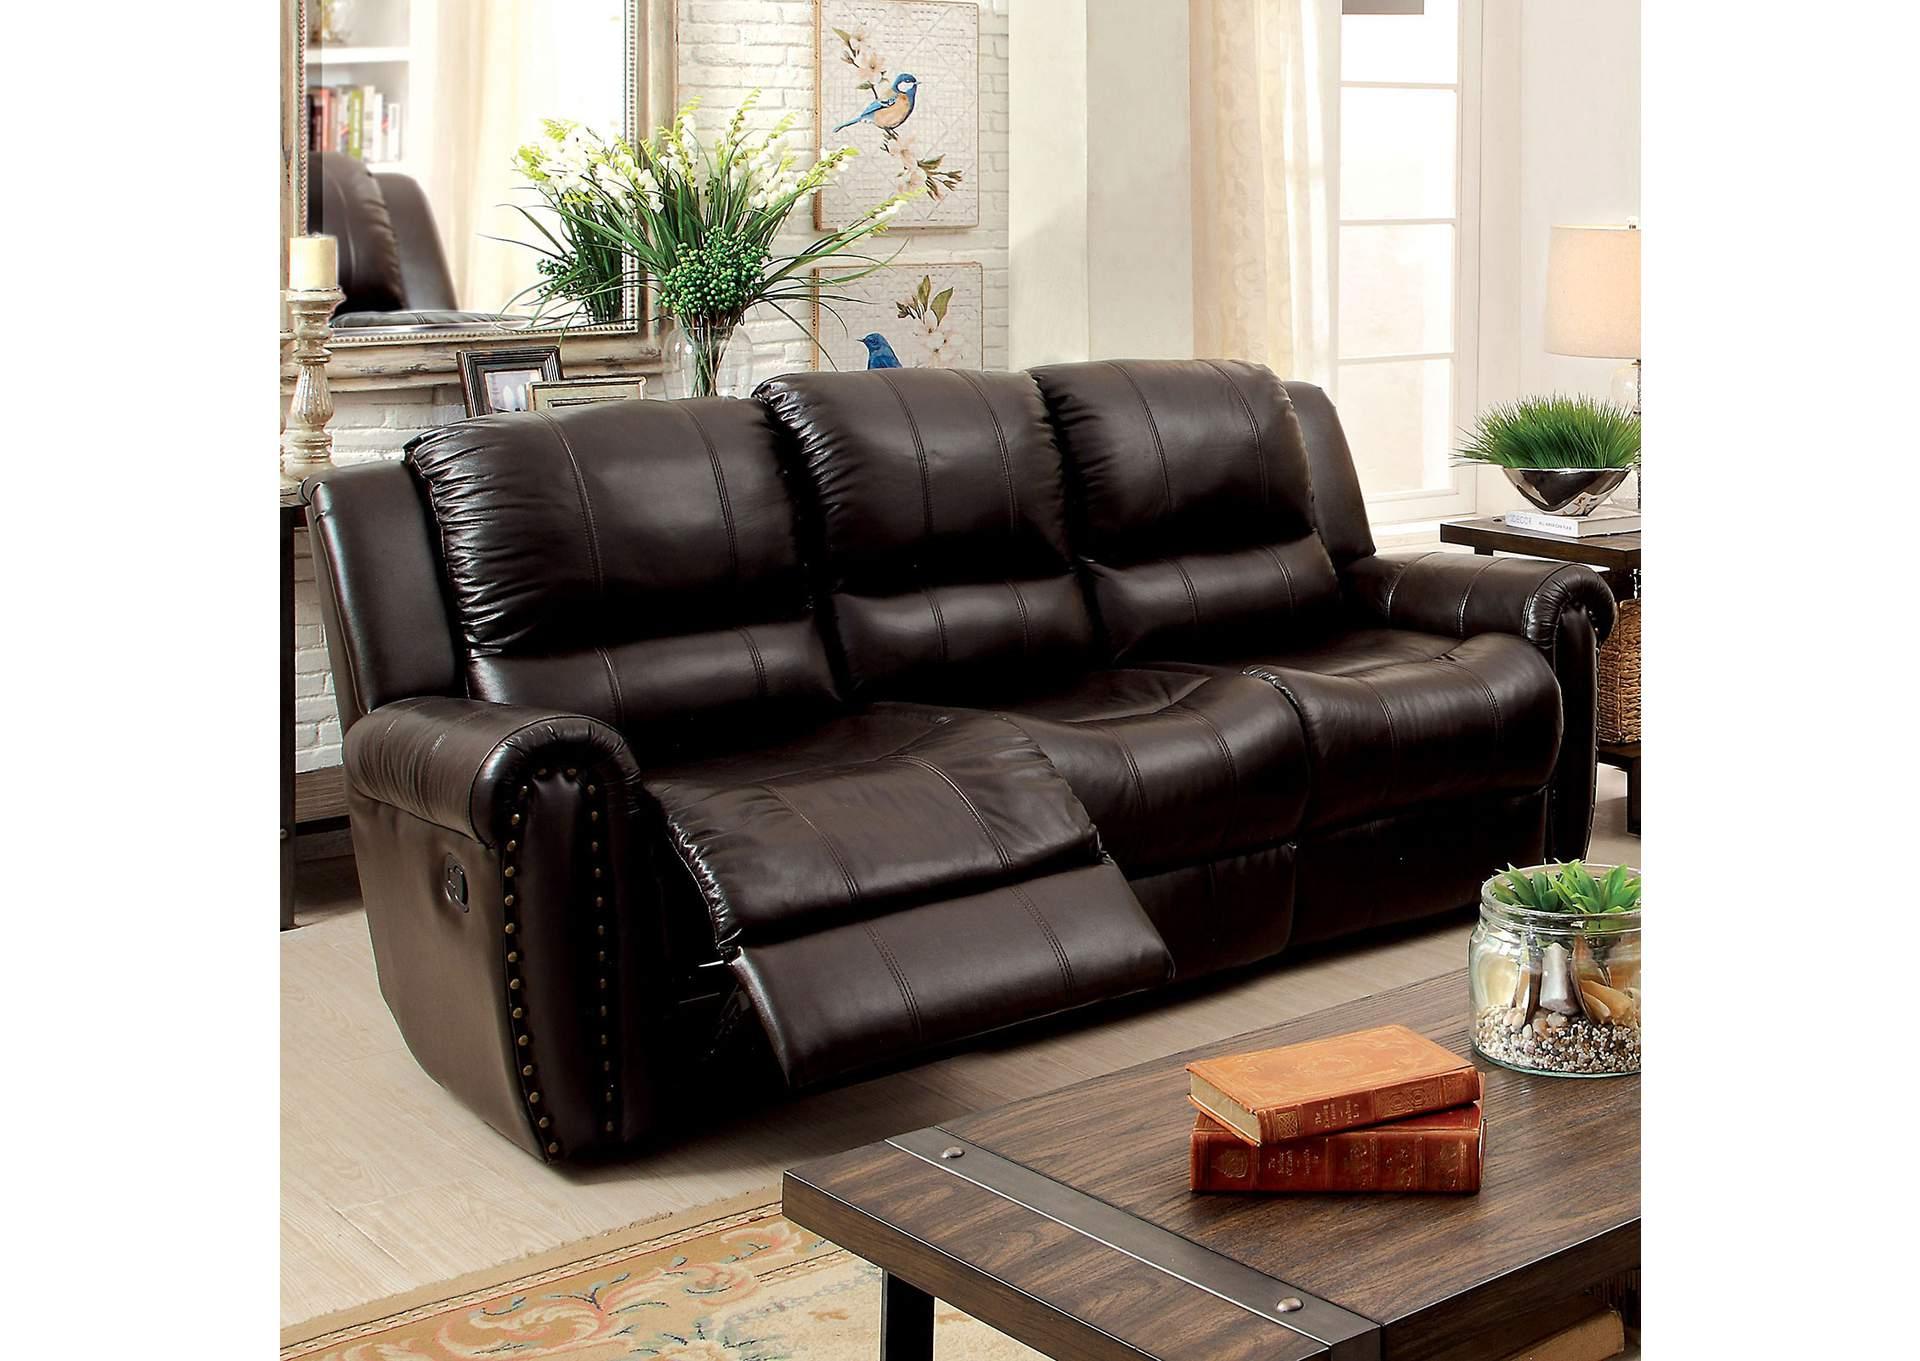 278680 Foxboro Brown Leather Sofa